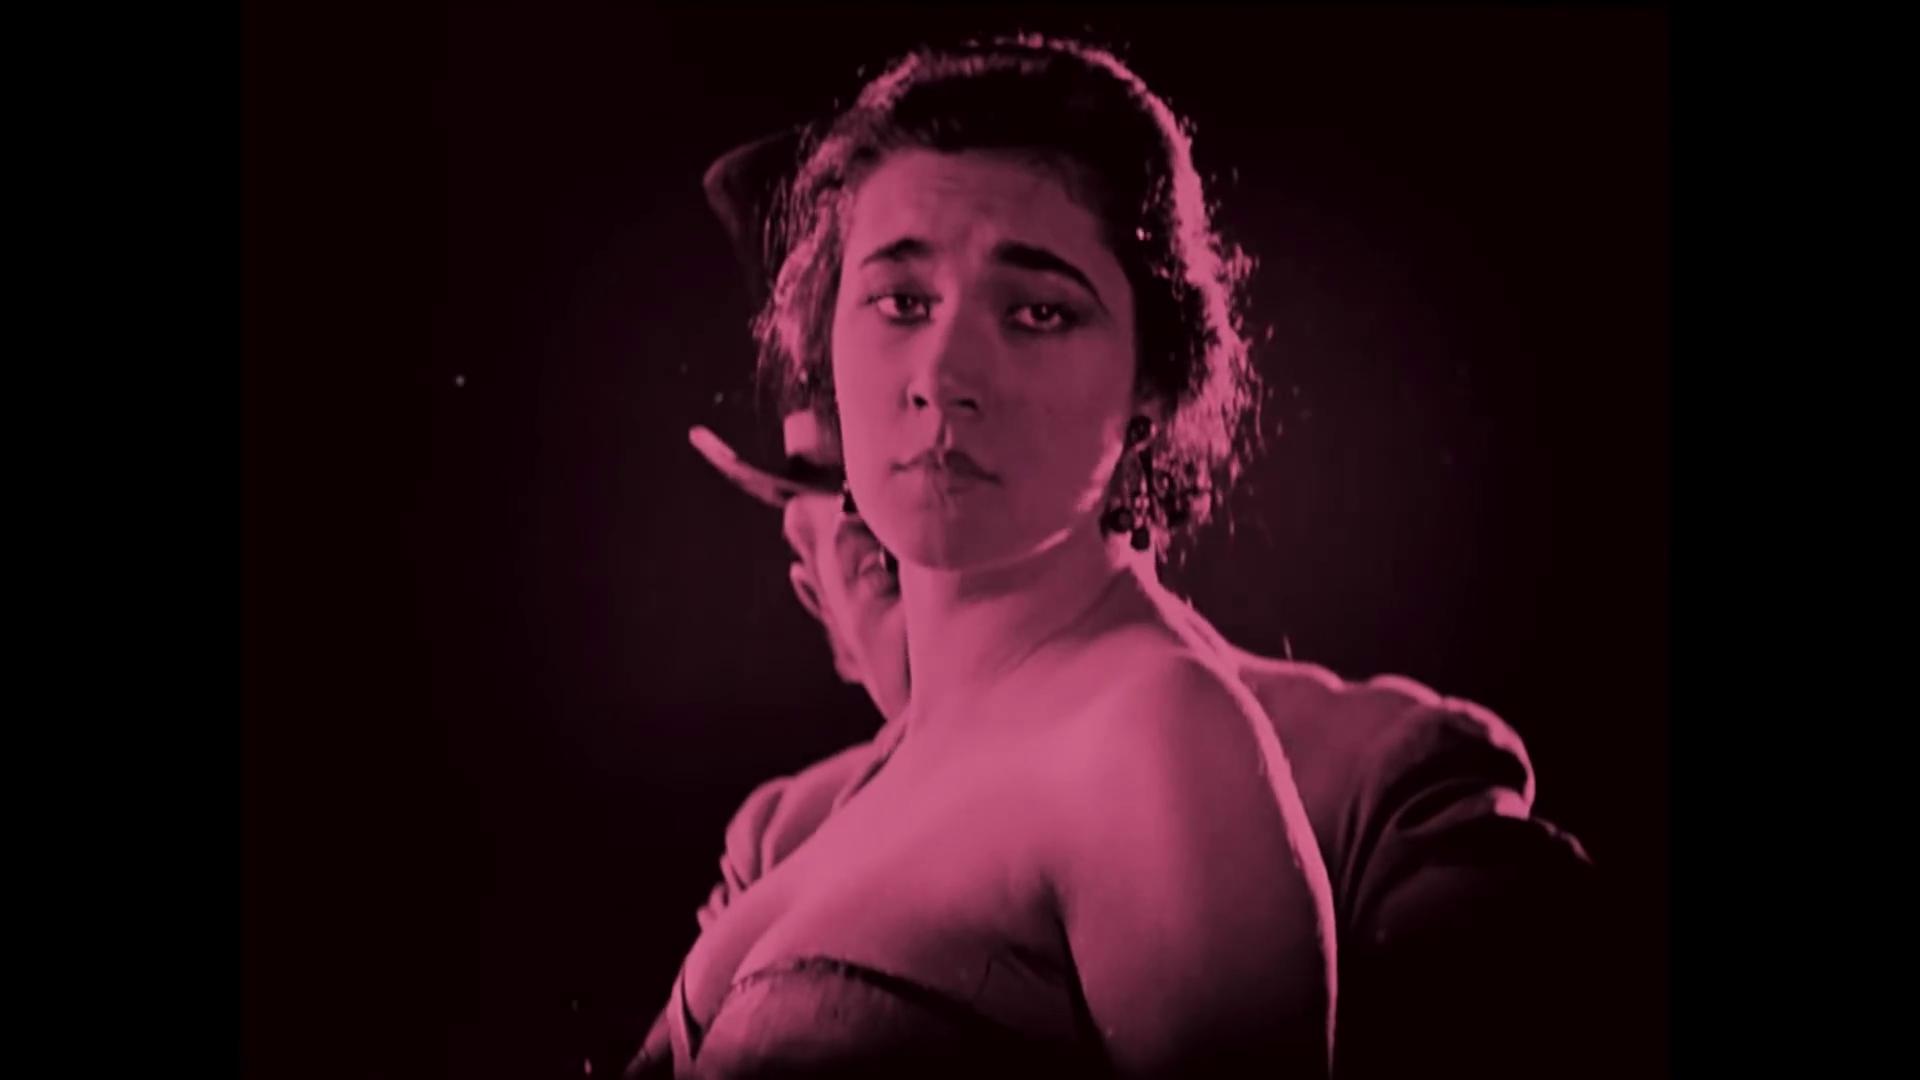 Nita Naldi dans le film Dr. Jekyll and Mr. Hyde (Docteur Jekyll et M. Hyde, 1920) de John S. Robertson